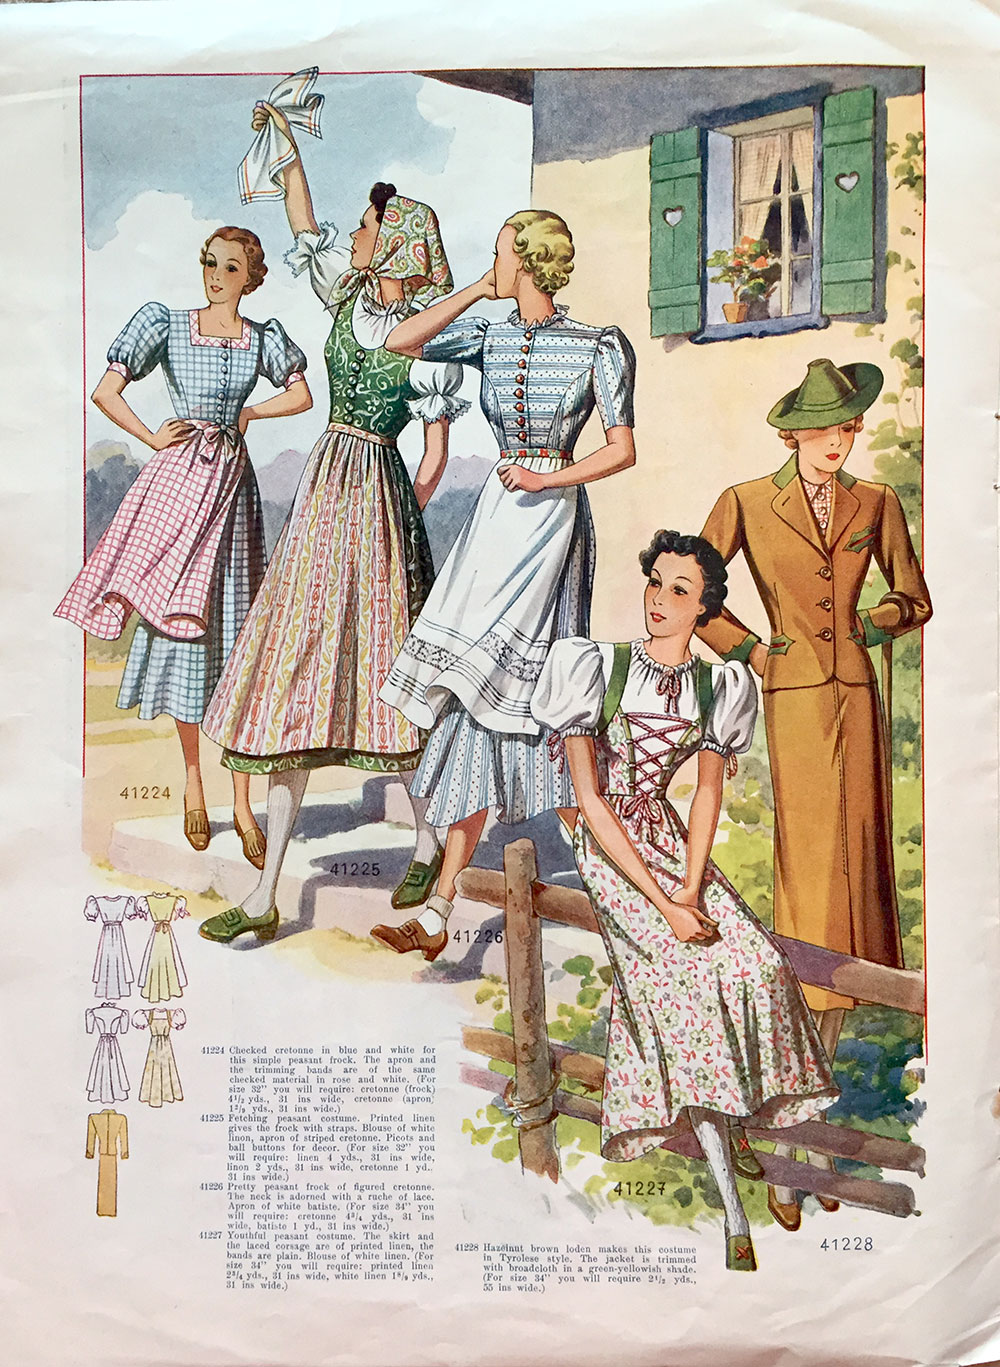 1938 Dirndl dresses